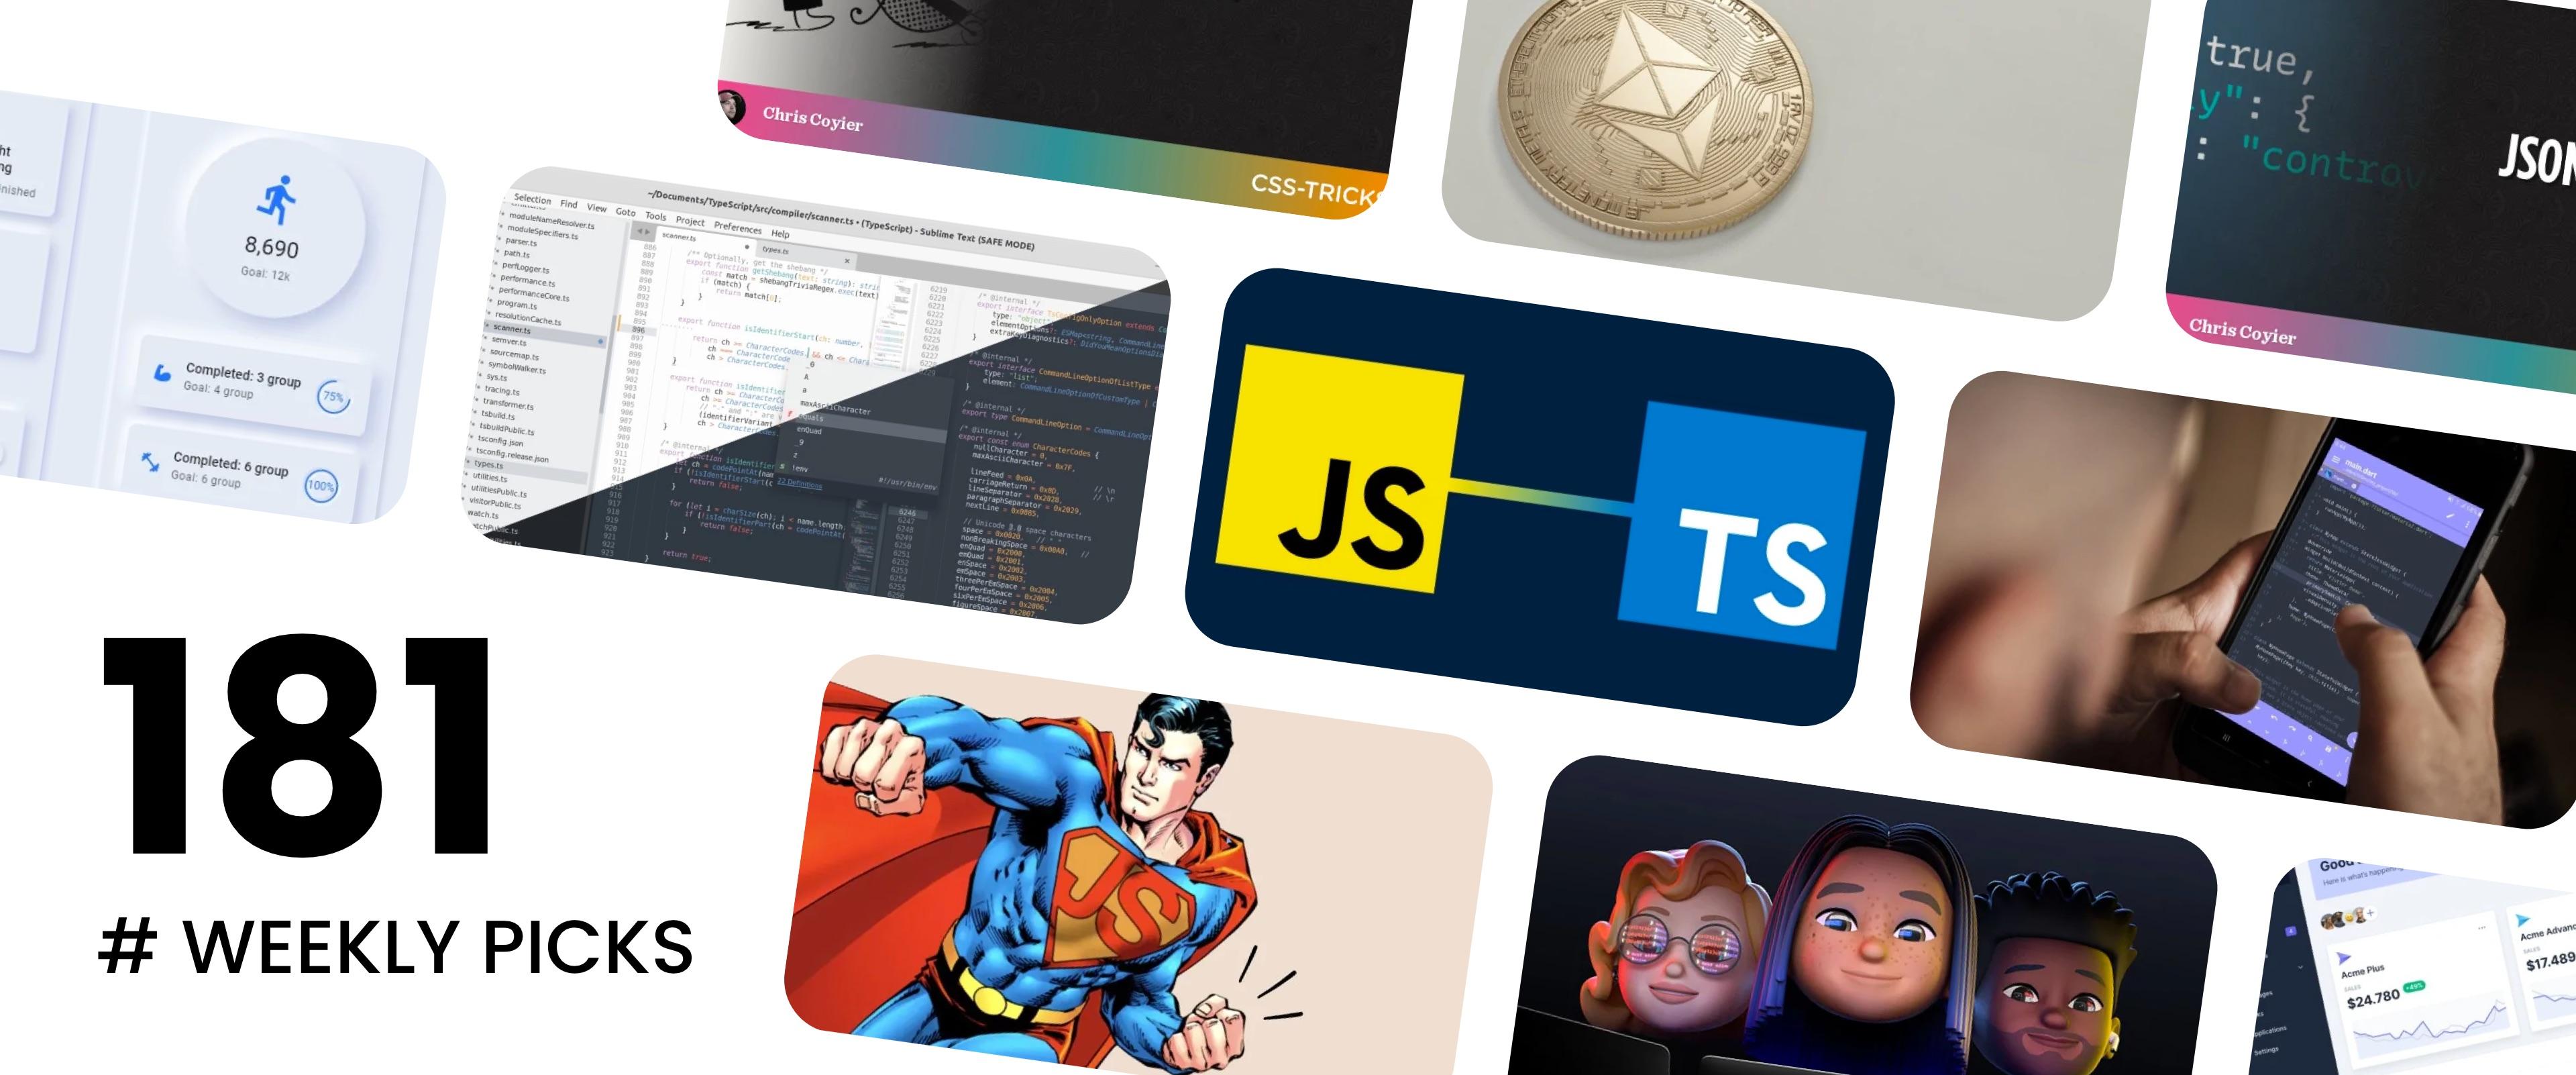 Notion API, Ethereum Development, WWDC21 - Picks #181